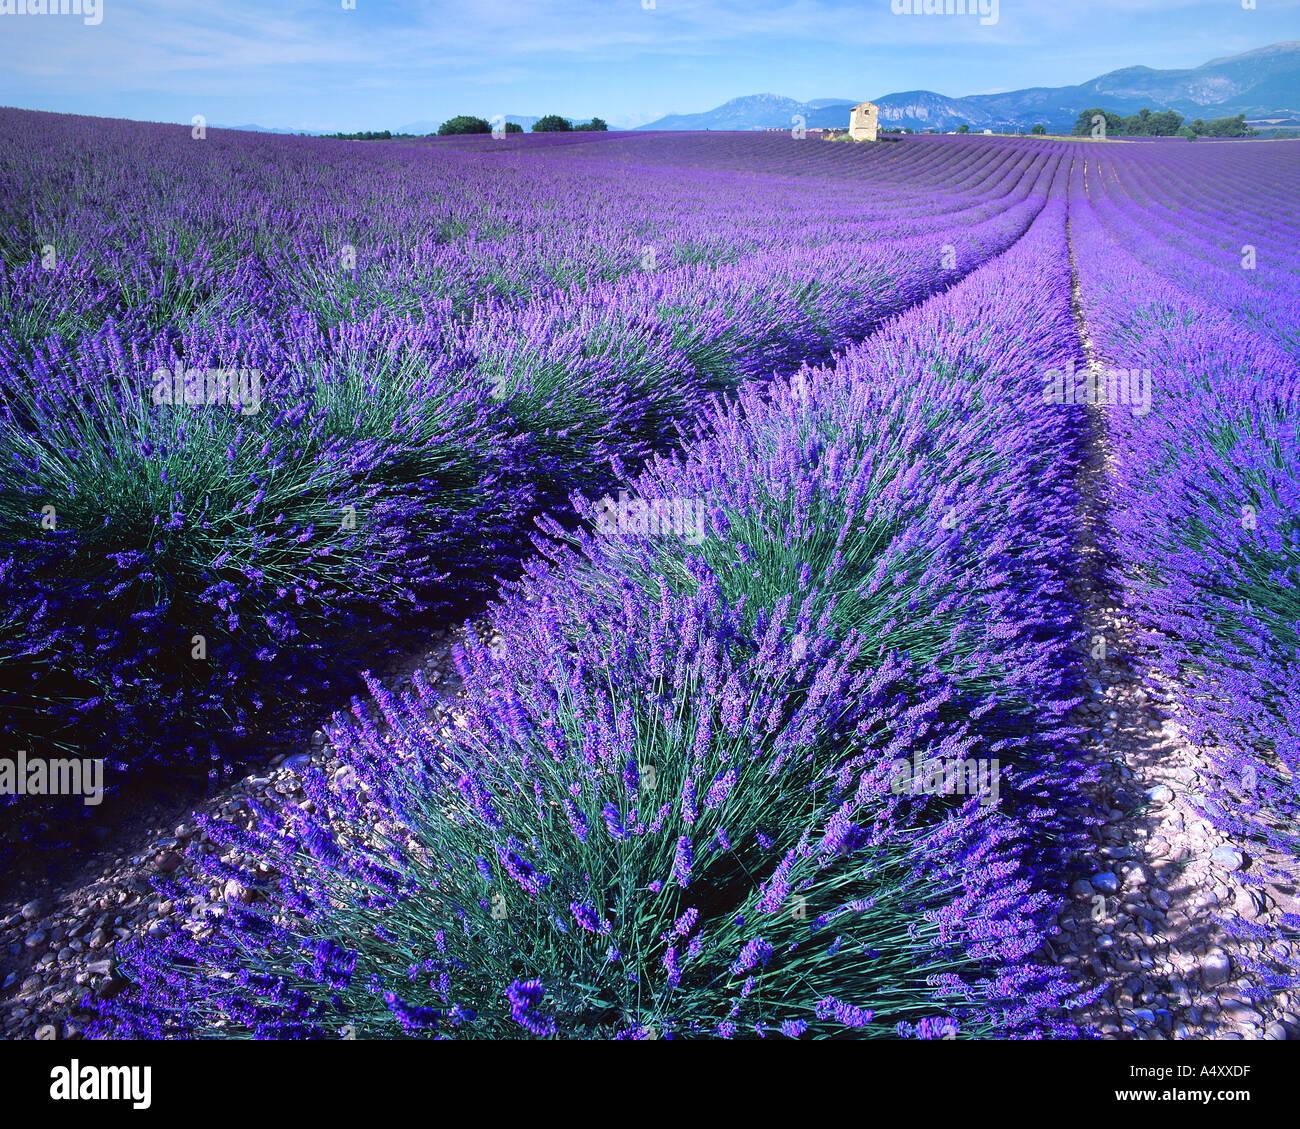 FR - Alpes de Haute Provence: Campo de lavanda Imagen De Stock